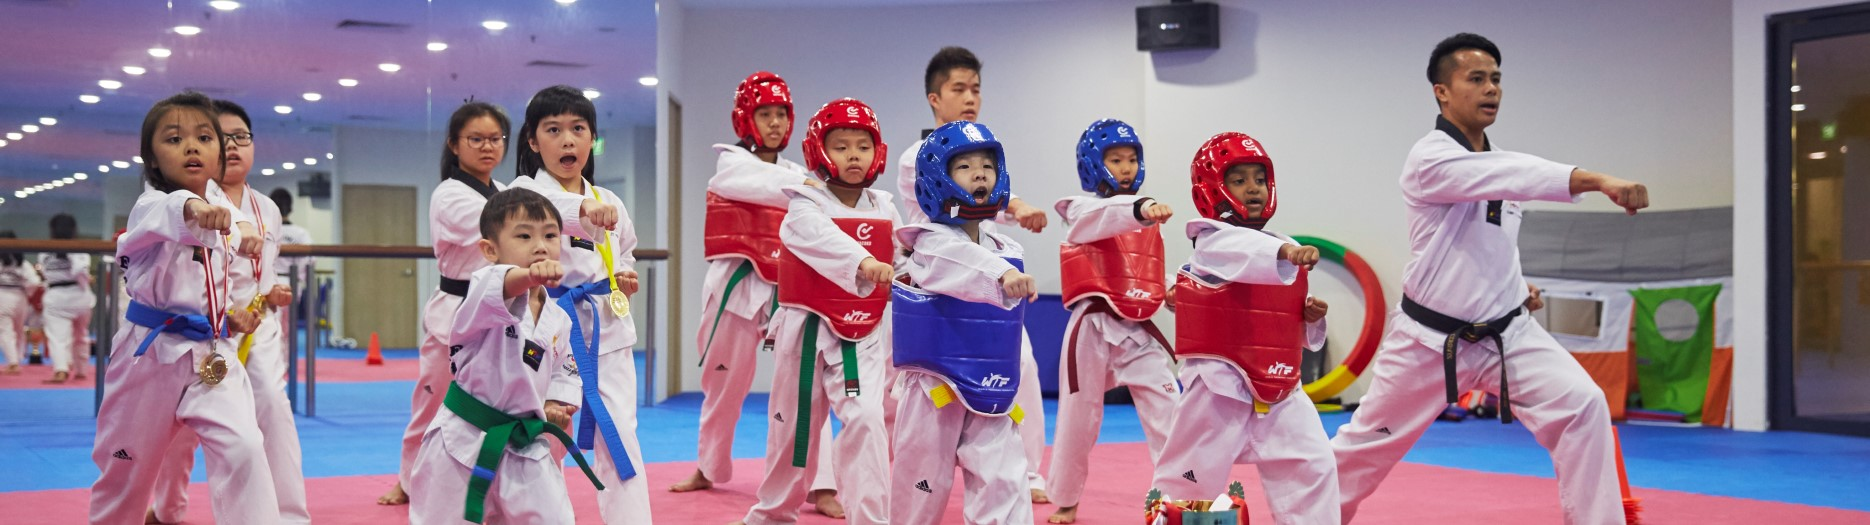 Taekwondonomics 1870x525